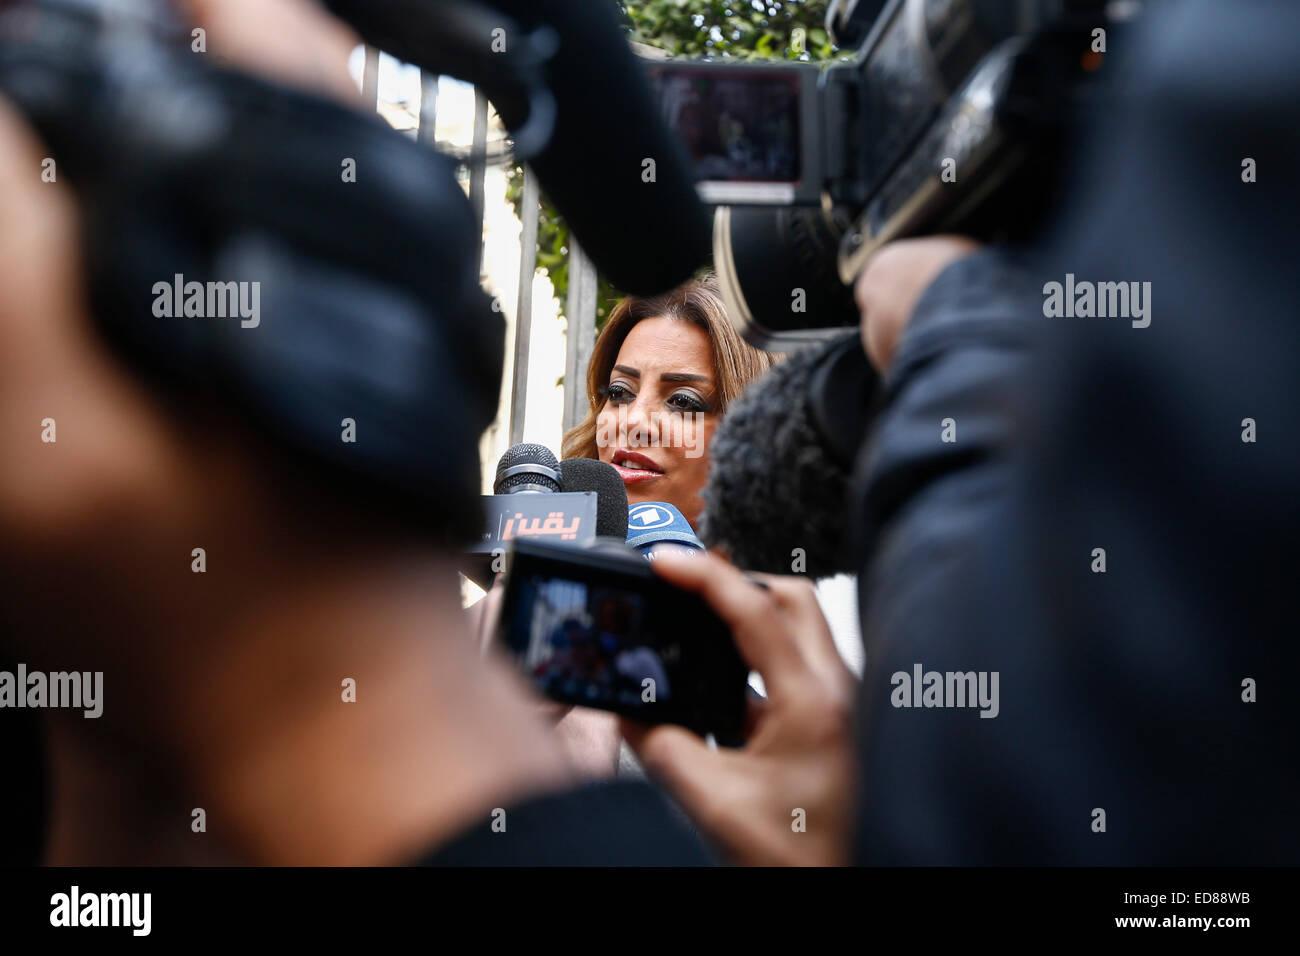 (150101) -- CAIRO, Jan. 1, 2015 (Xinhua) -- Marwa Omara, the fiancee of Egyptian-Canadian Al-Jazeera English journalist - Stock Image